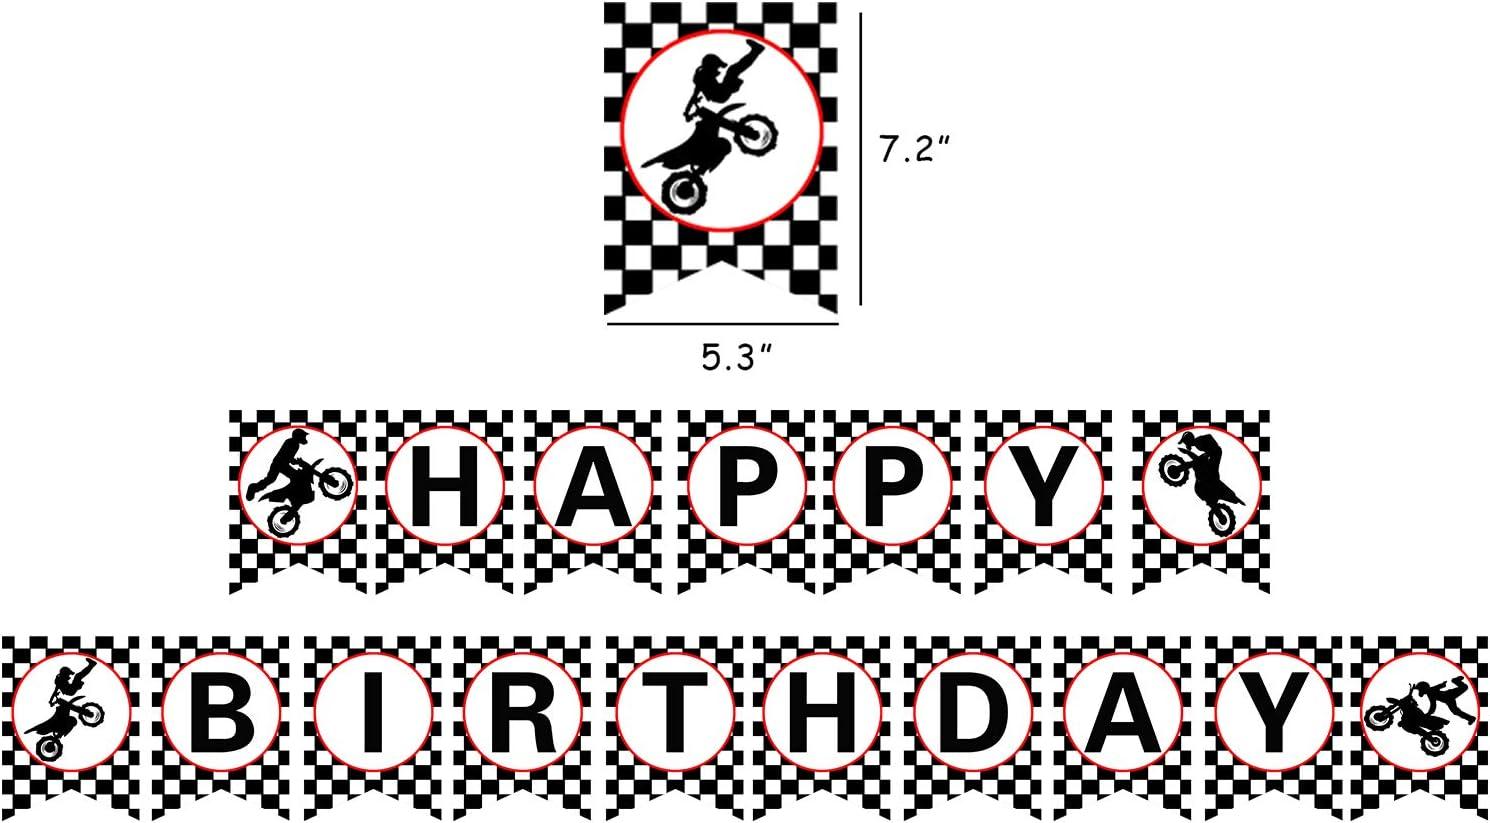 Motocross Birthday Banner Dirt Bike Happy Birthday Banner Motocross Dirt Bike Party Decorations. Motocross Happy Birthday Banner